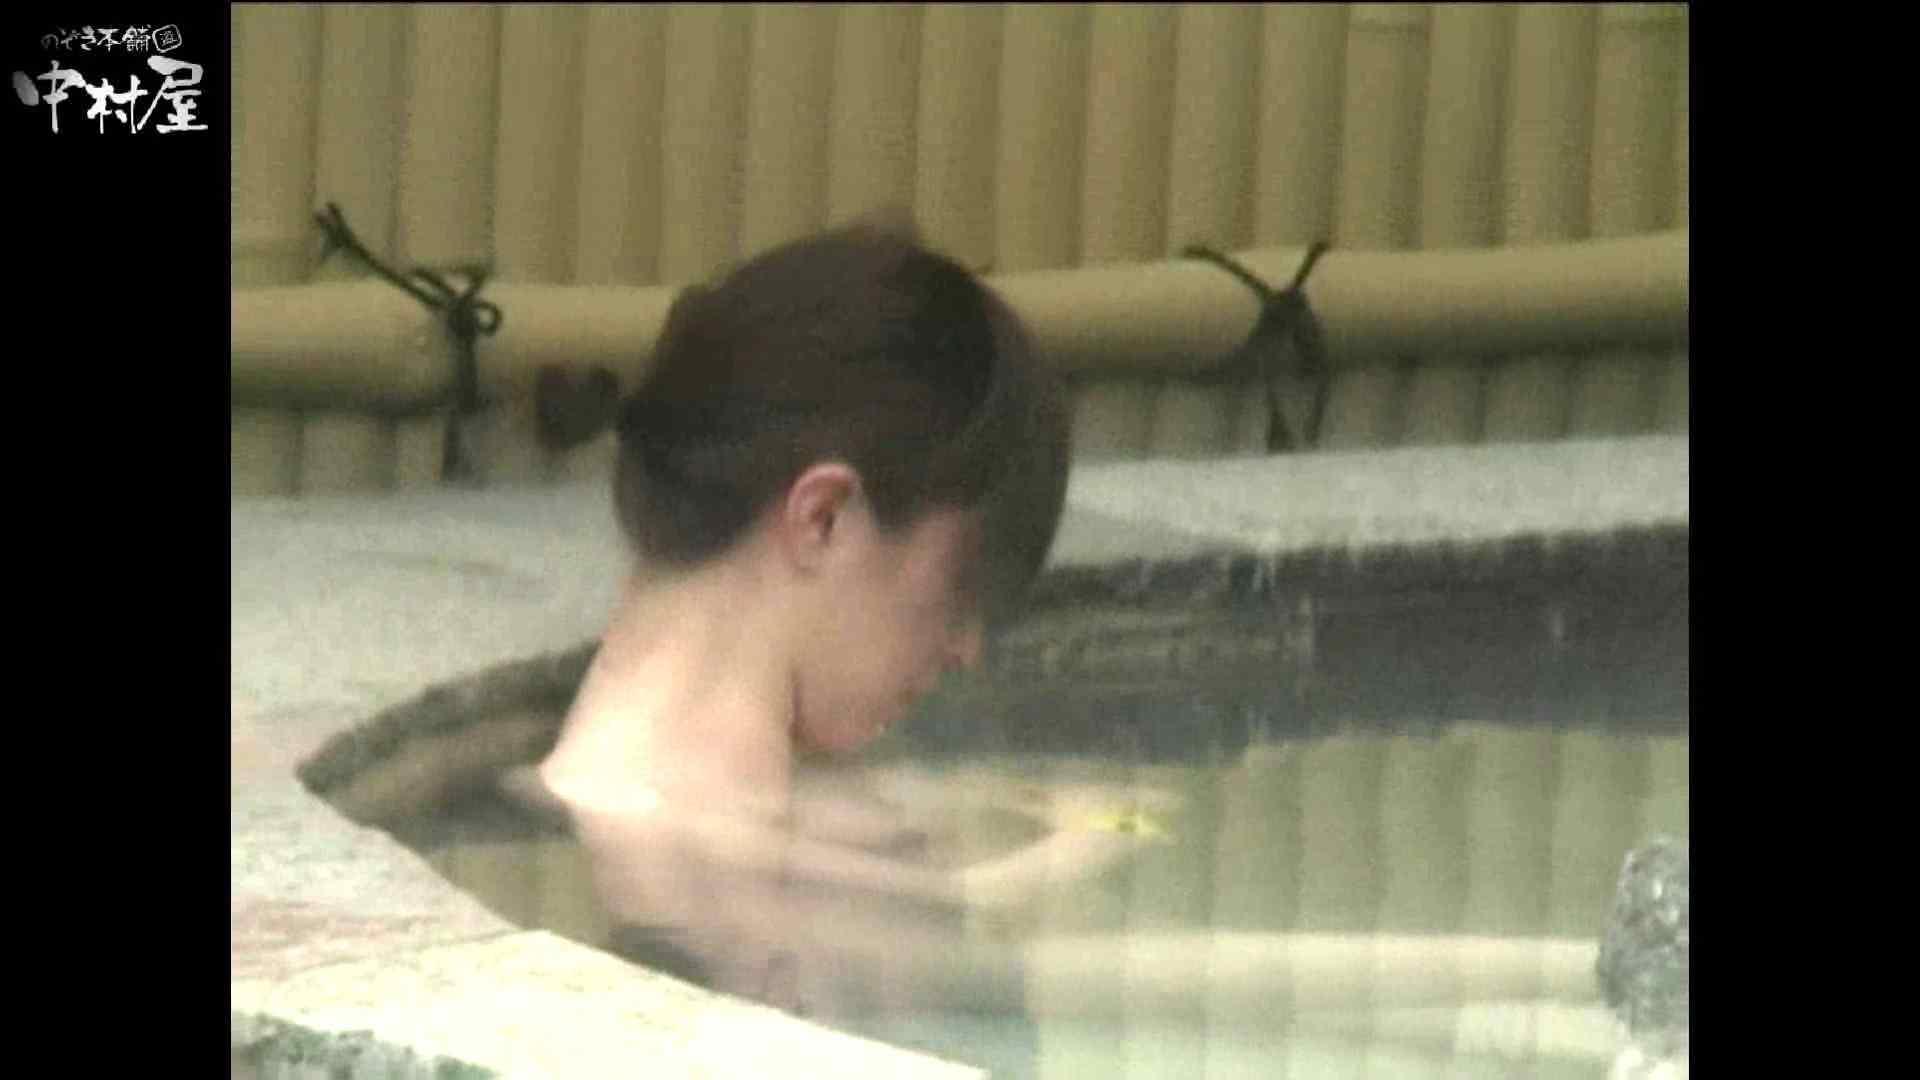 Aquaな露天風呂Vol.875潜入盗撮露天風呂十一判湯 其の一 盗撮師作品  96pic 32